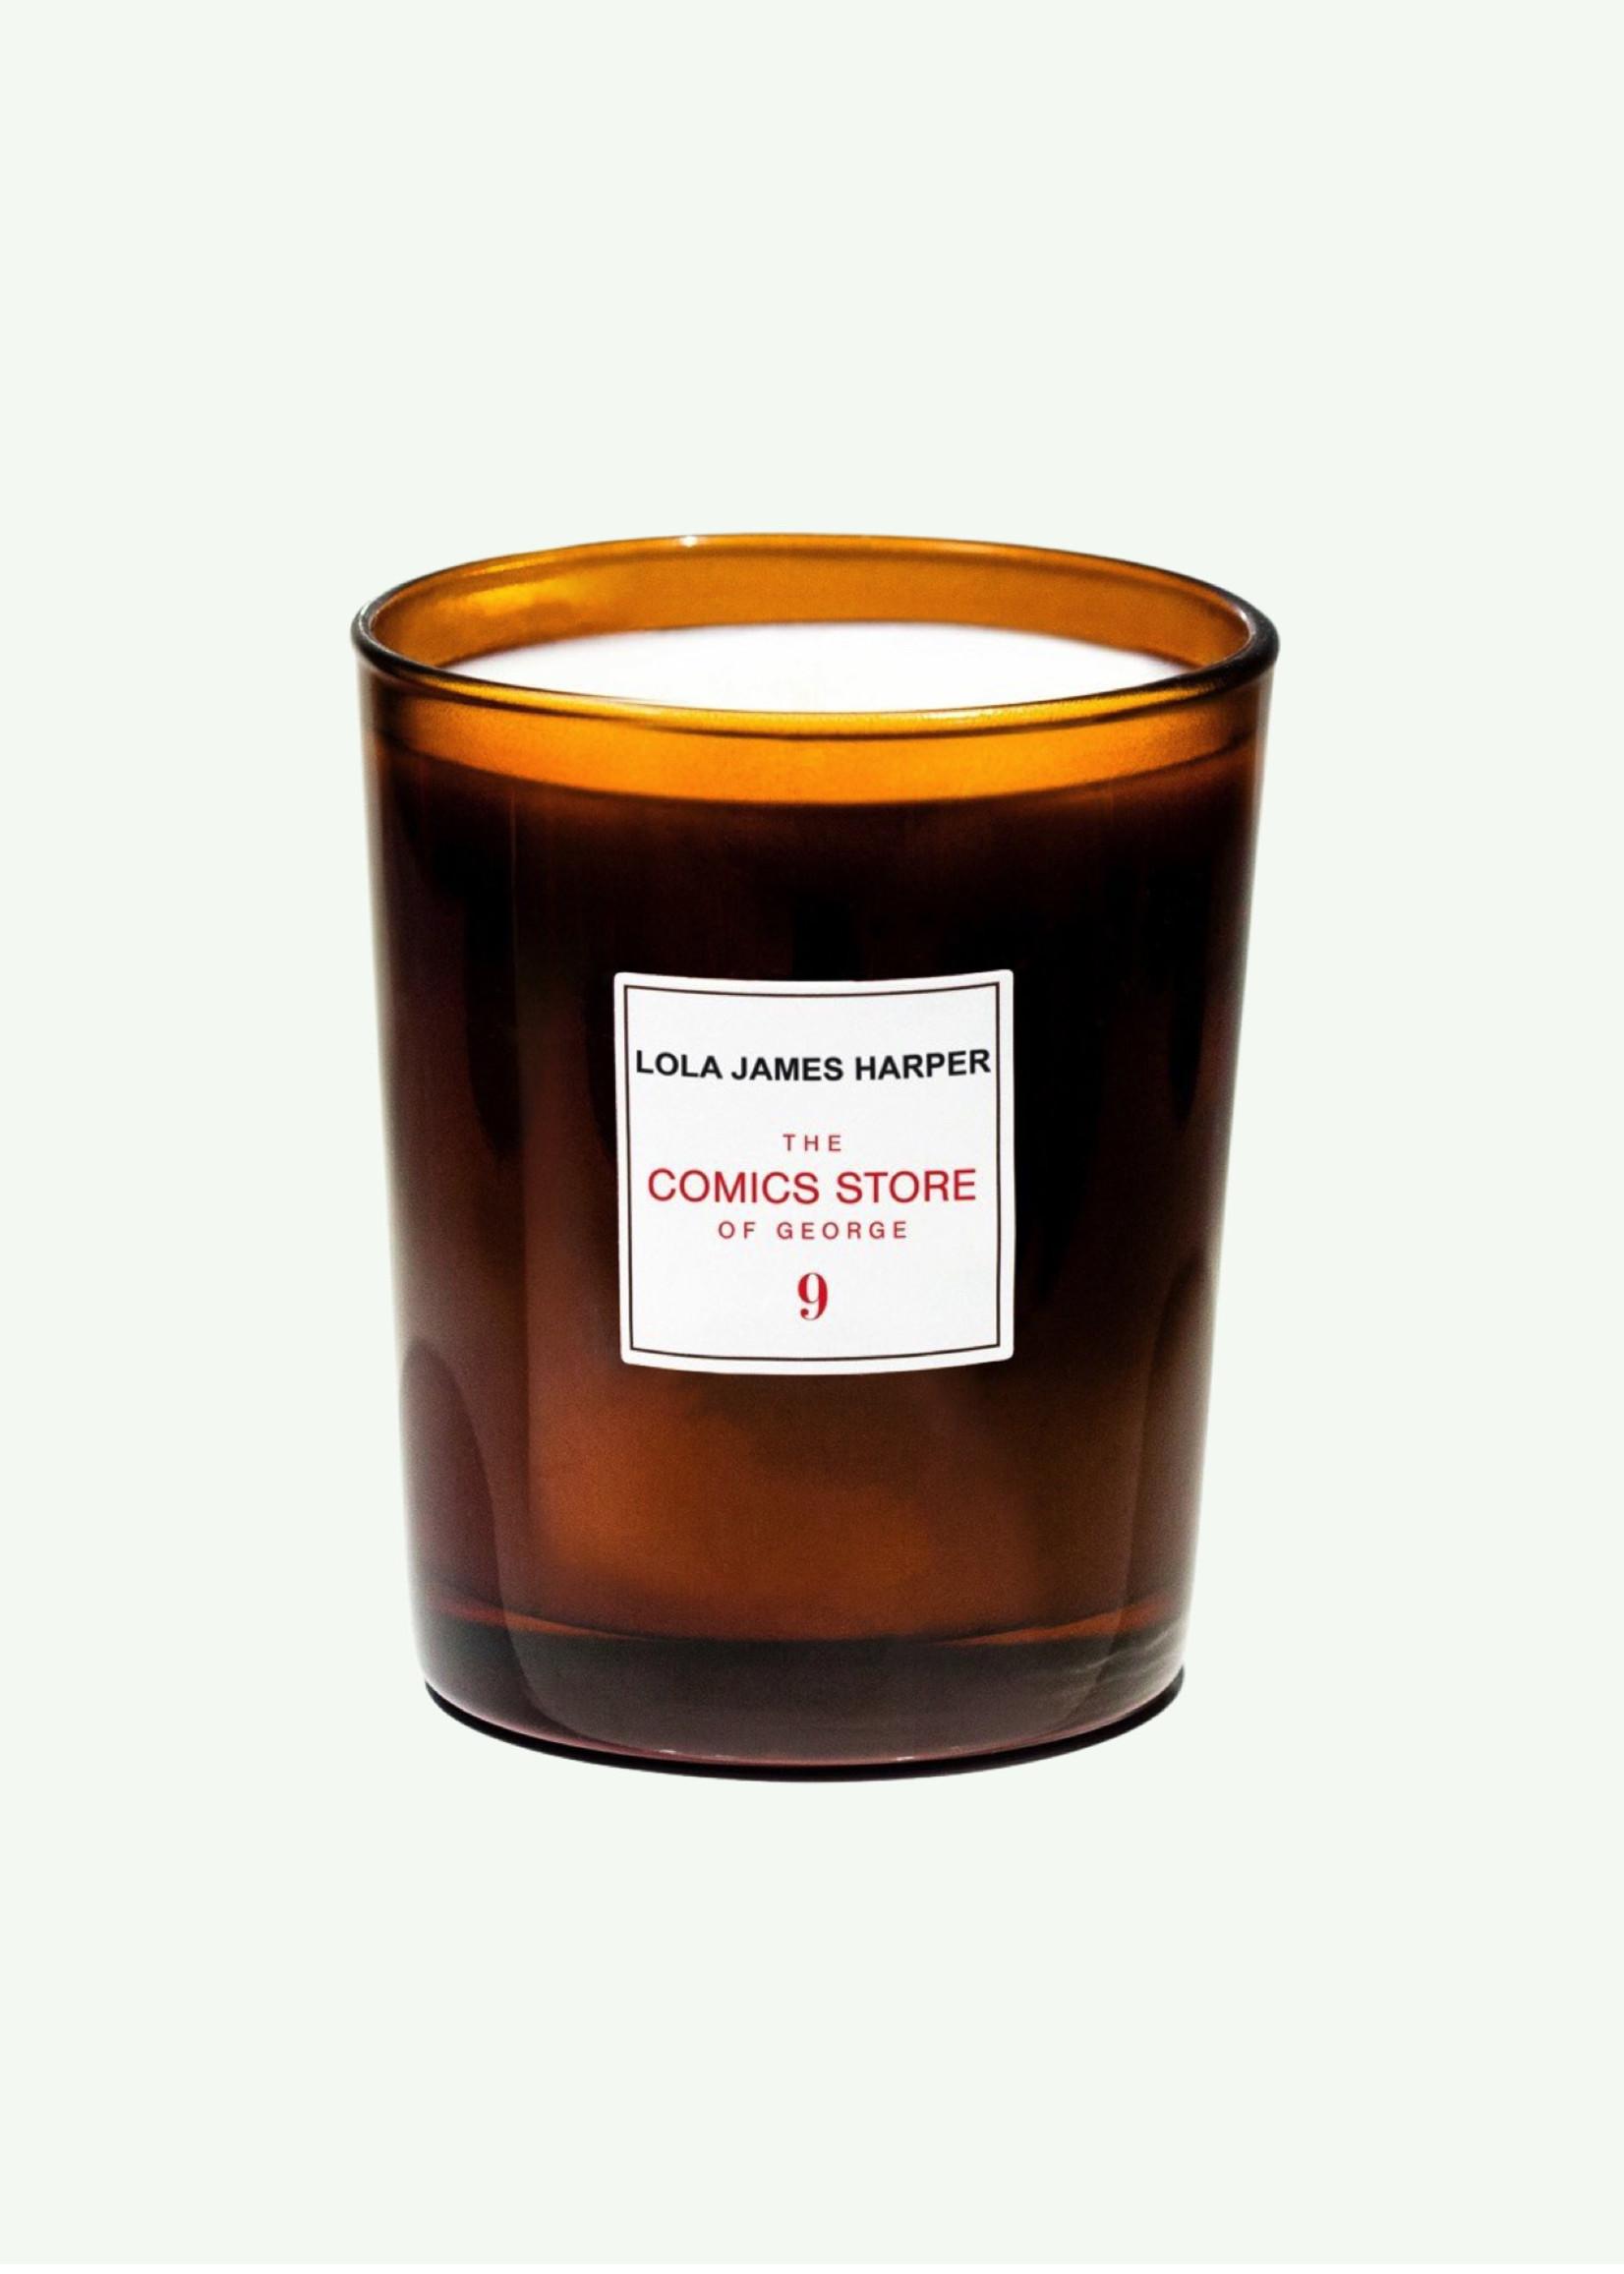 Lola James Harper Lola James Harper - The Comics Store of George - Scented Candle 190 gr